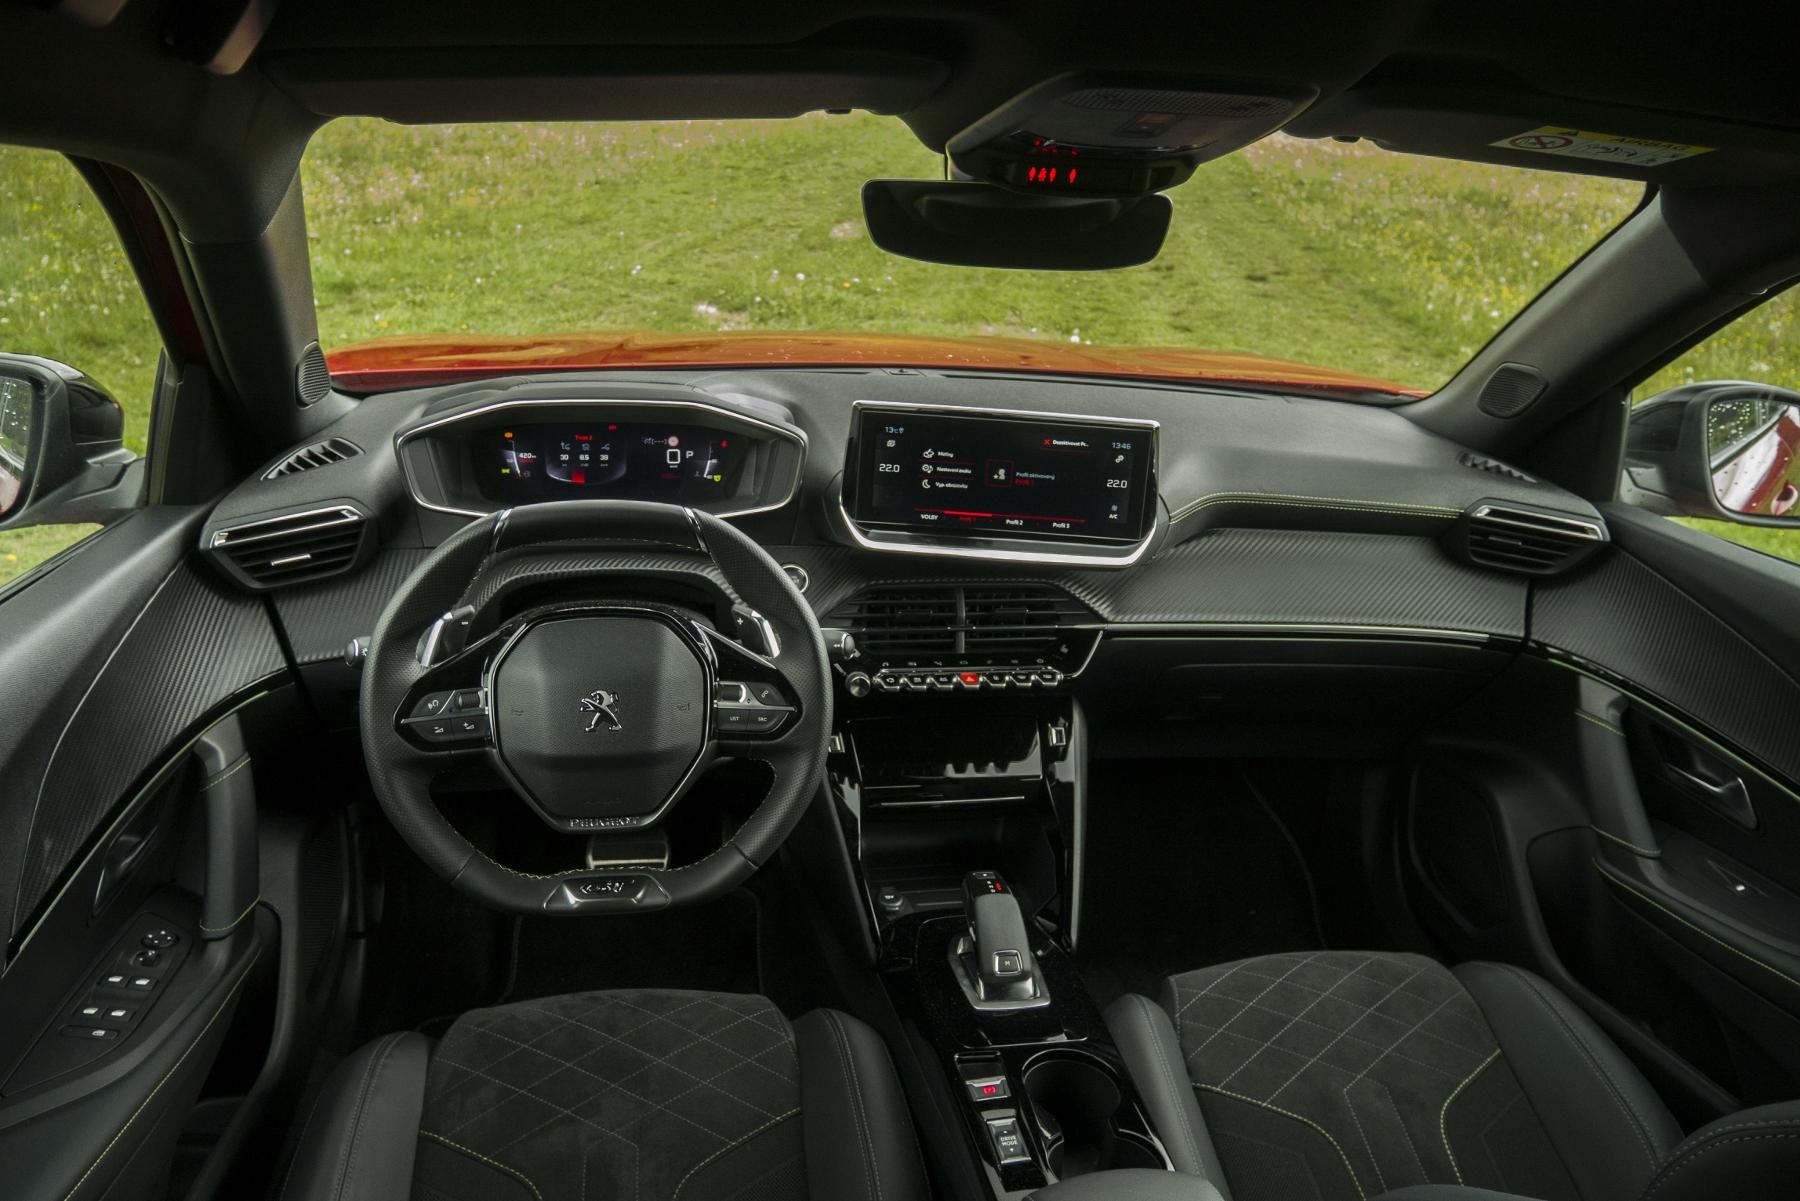 Test: Peugeot 2008 GT ohuruje silným trojvalcom a dobrou prevodovkou g5QaoUwG7e peugeot-2008-48